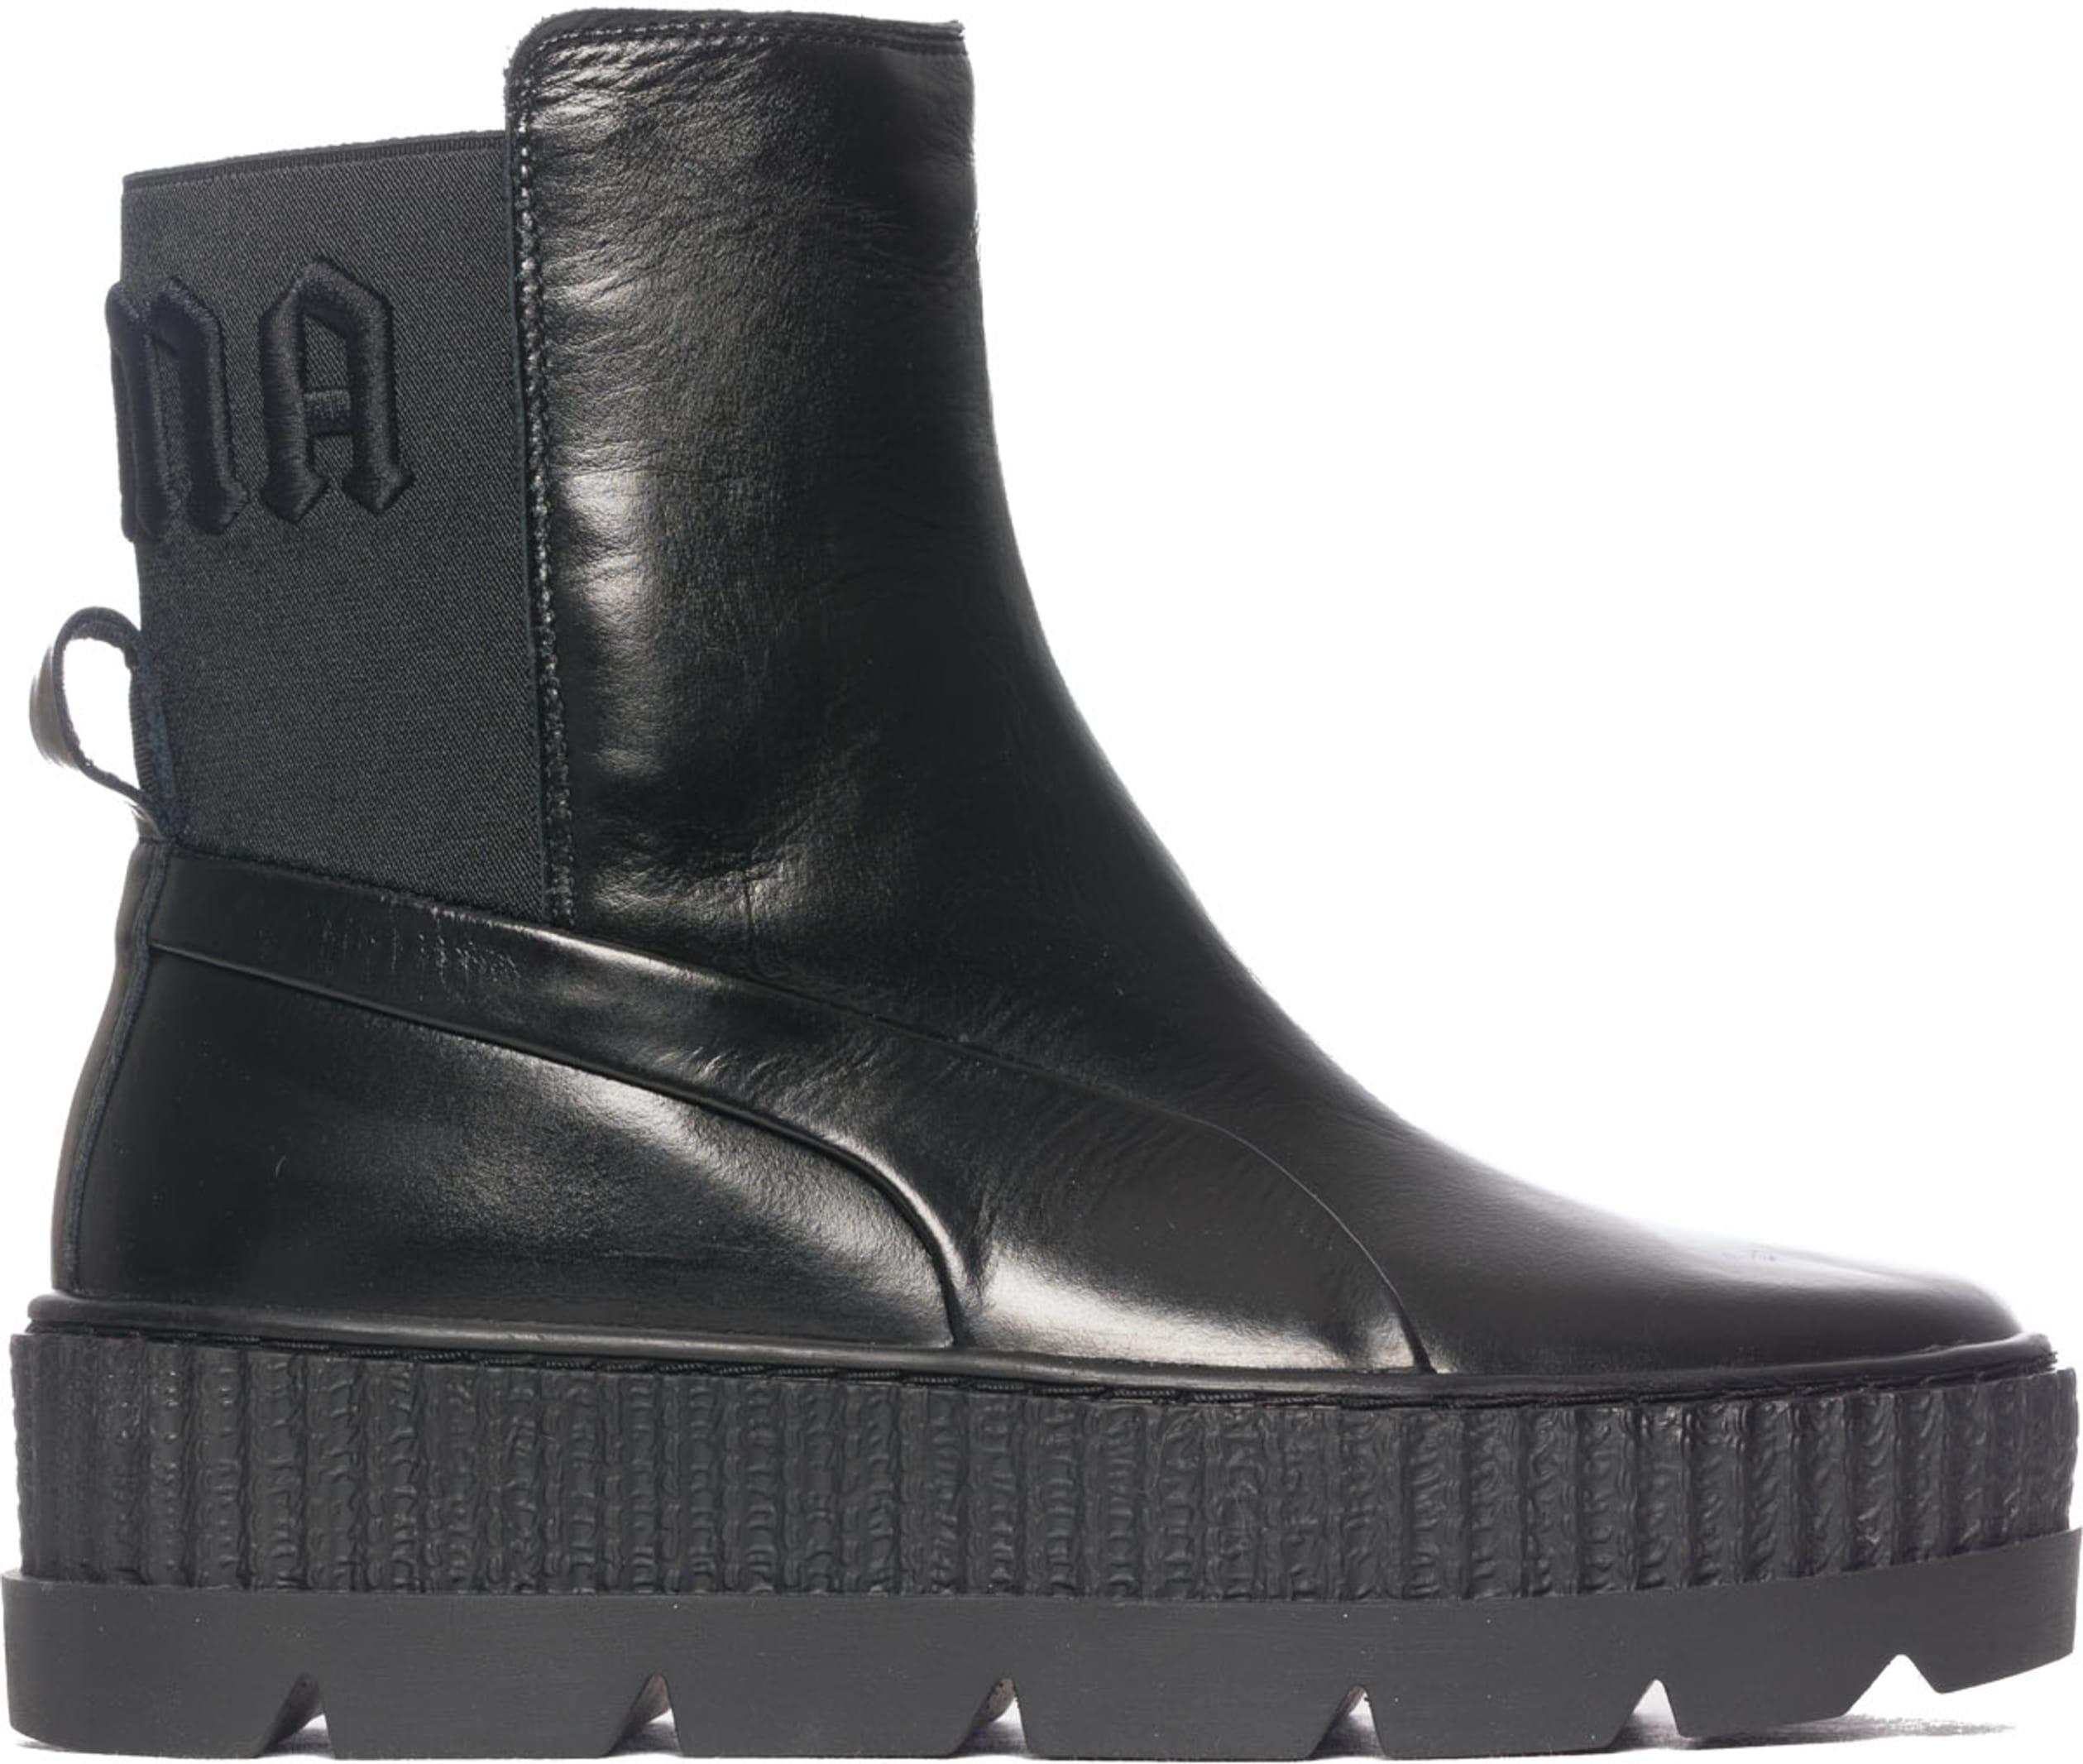 new arrival 0e256 03ee5 Puma - Fenty Chelsea Sneaker Boots - Puma Black